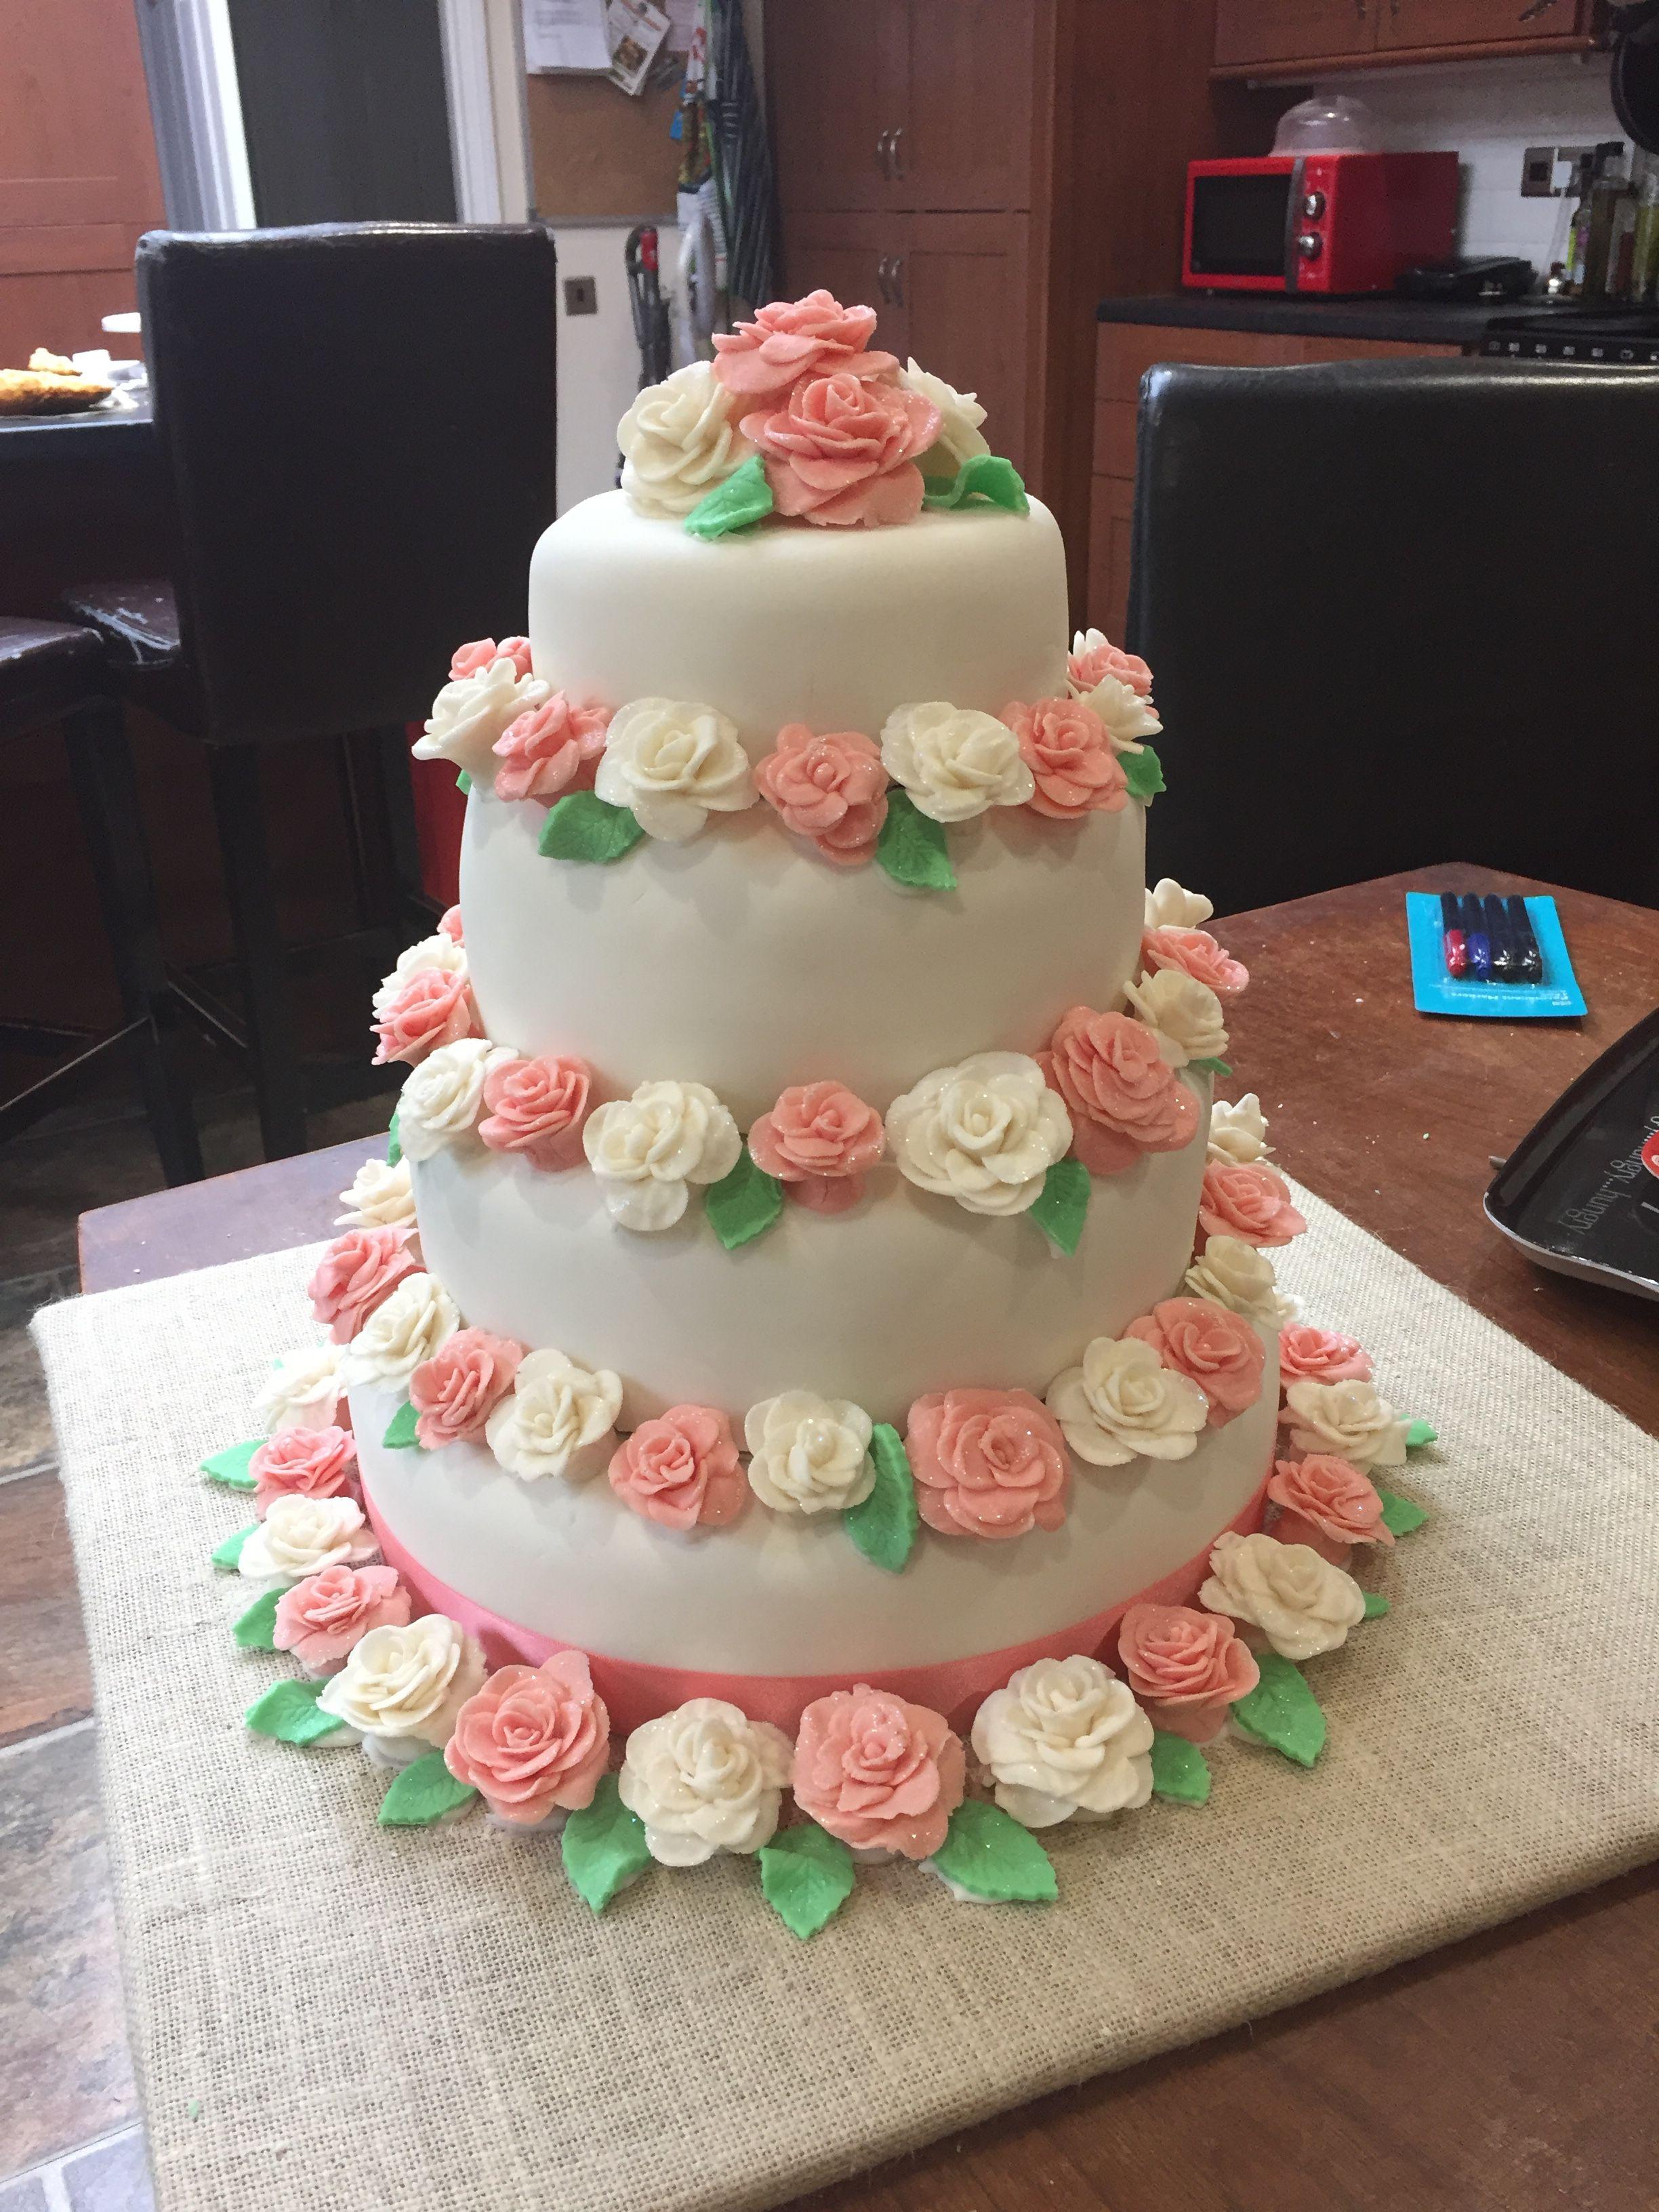 #wedding #weddingcake #coral #mrmrsbryant090916 #cake